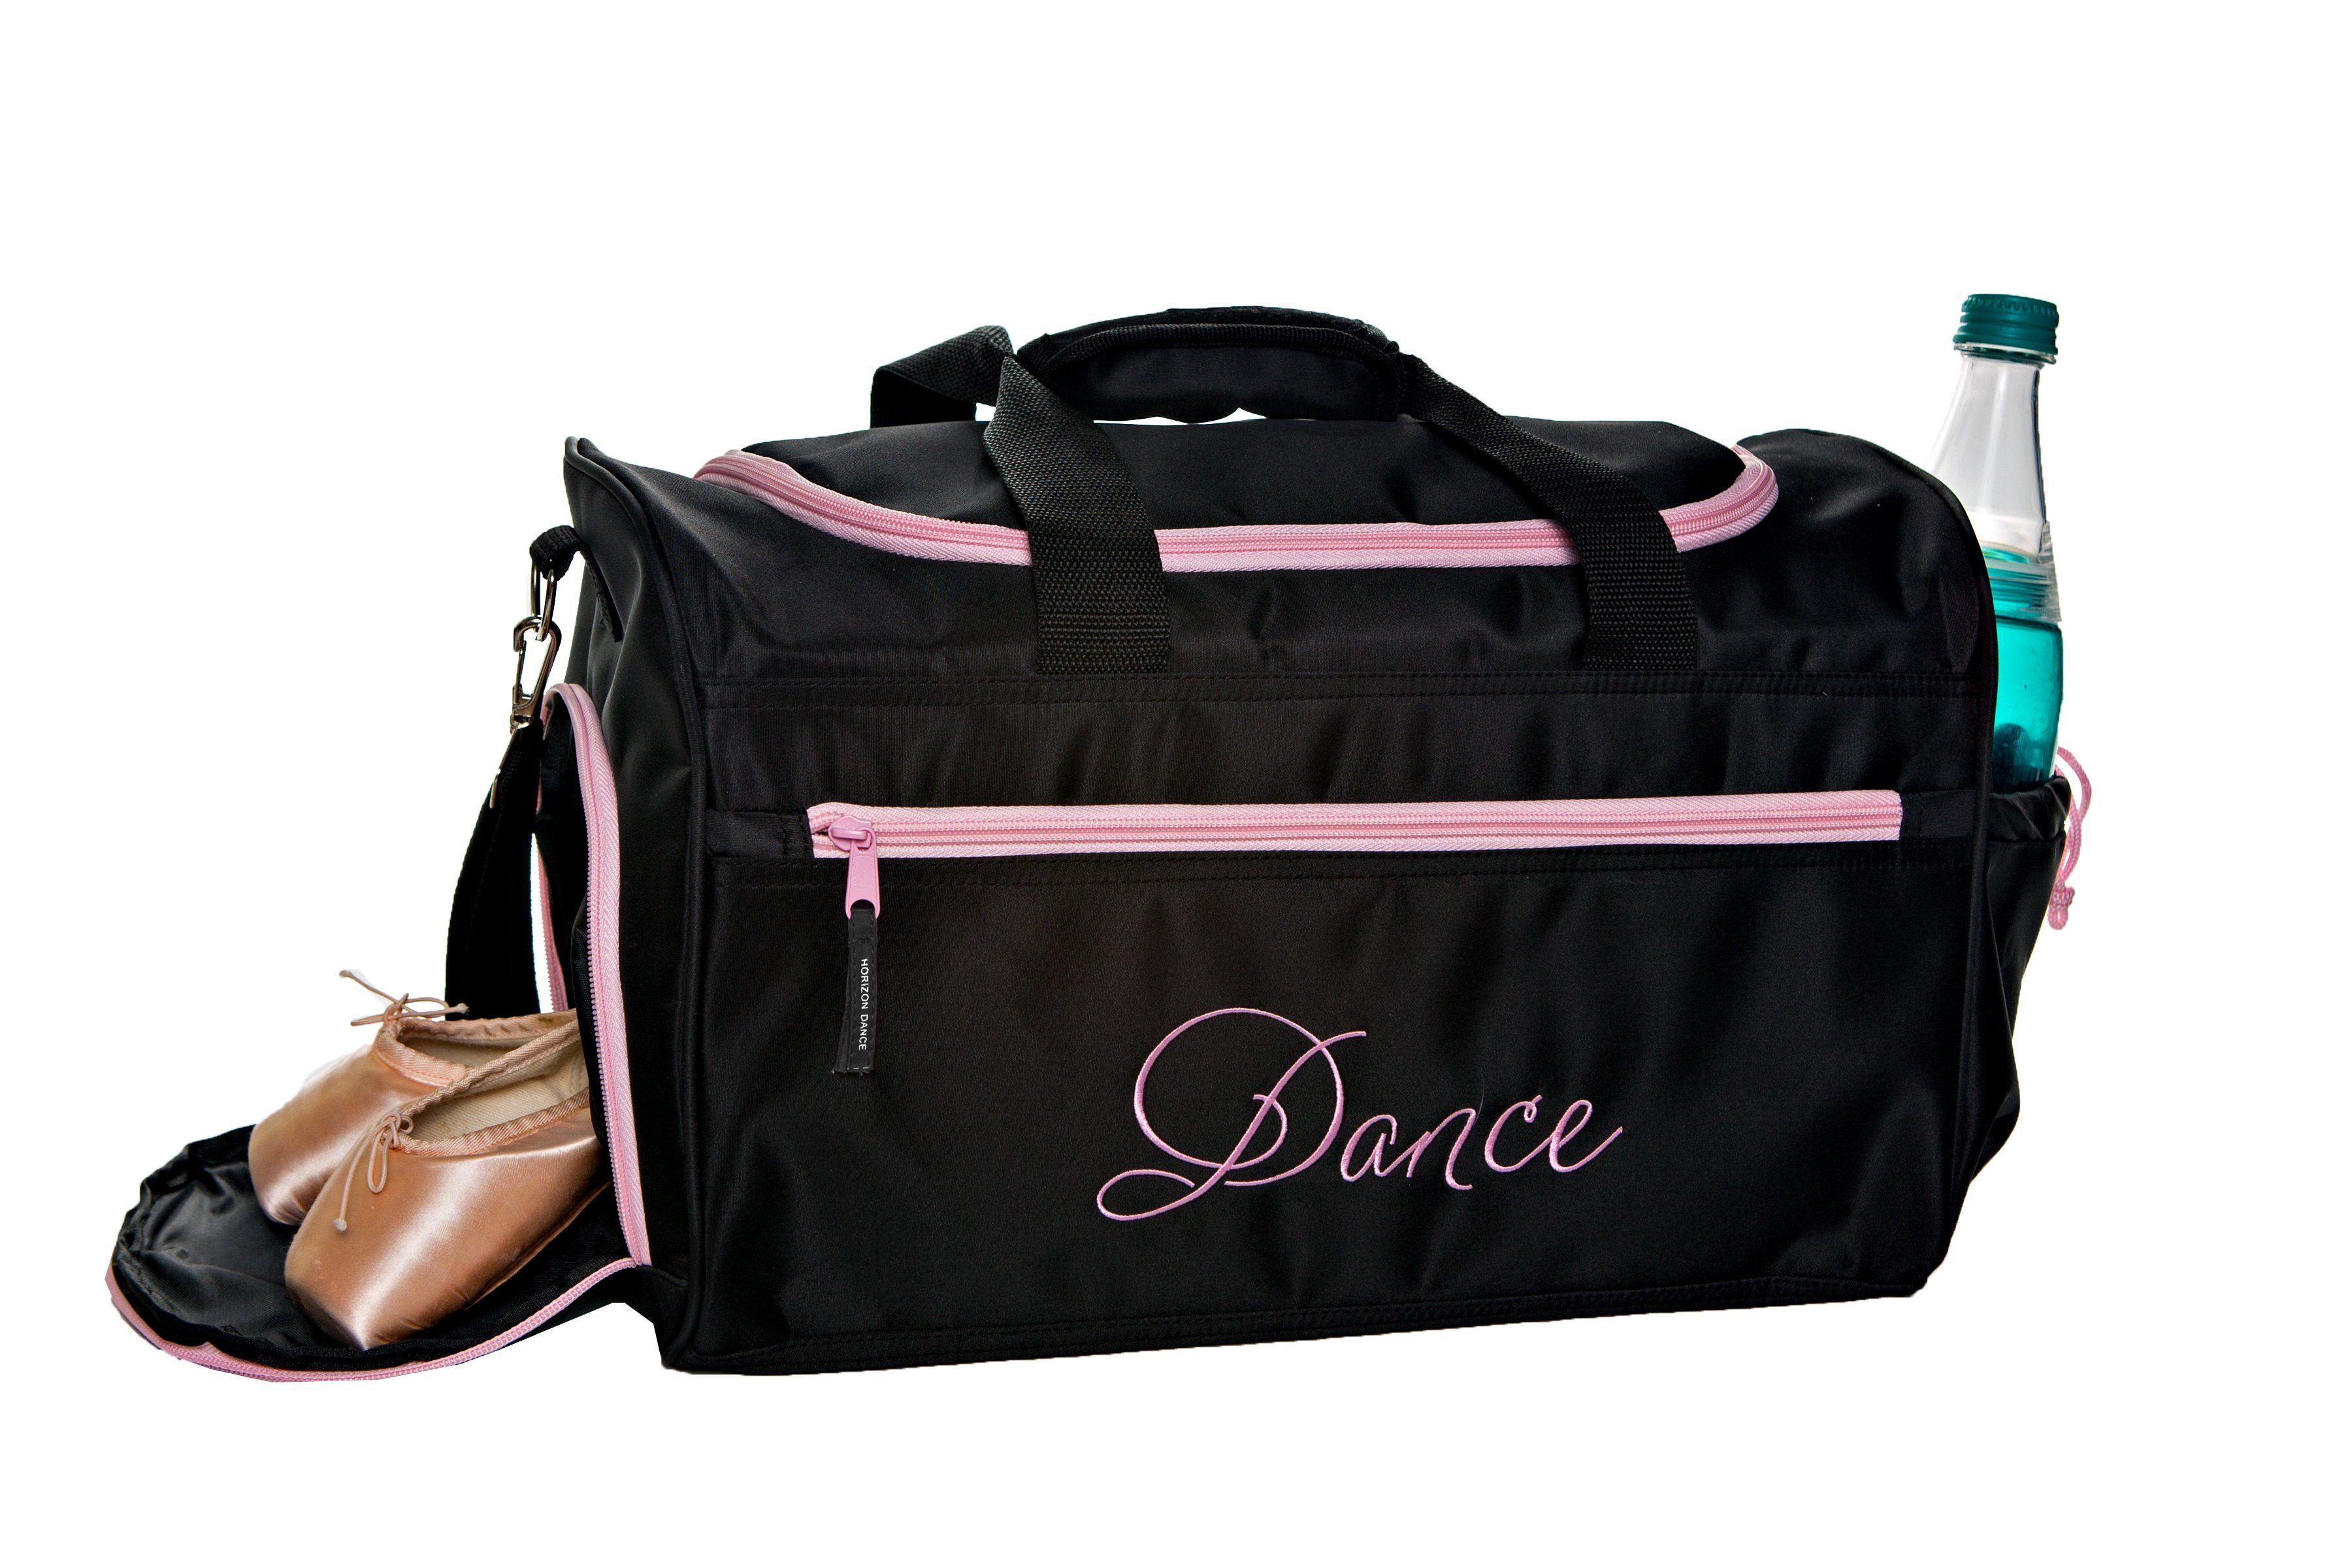 893d79cb1e38 HD6626 Dance Bag in 2019 | Leilah birthday gifts | Dance gear ...